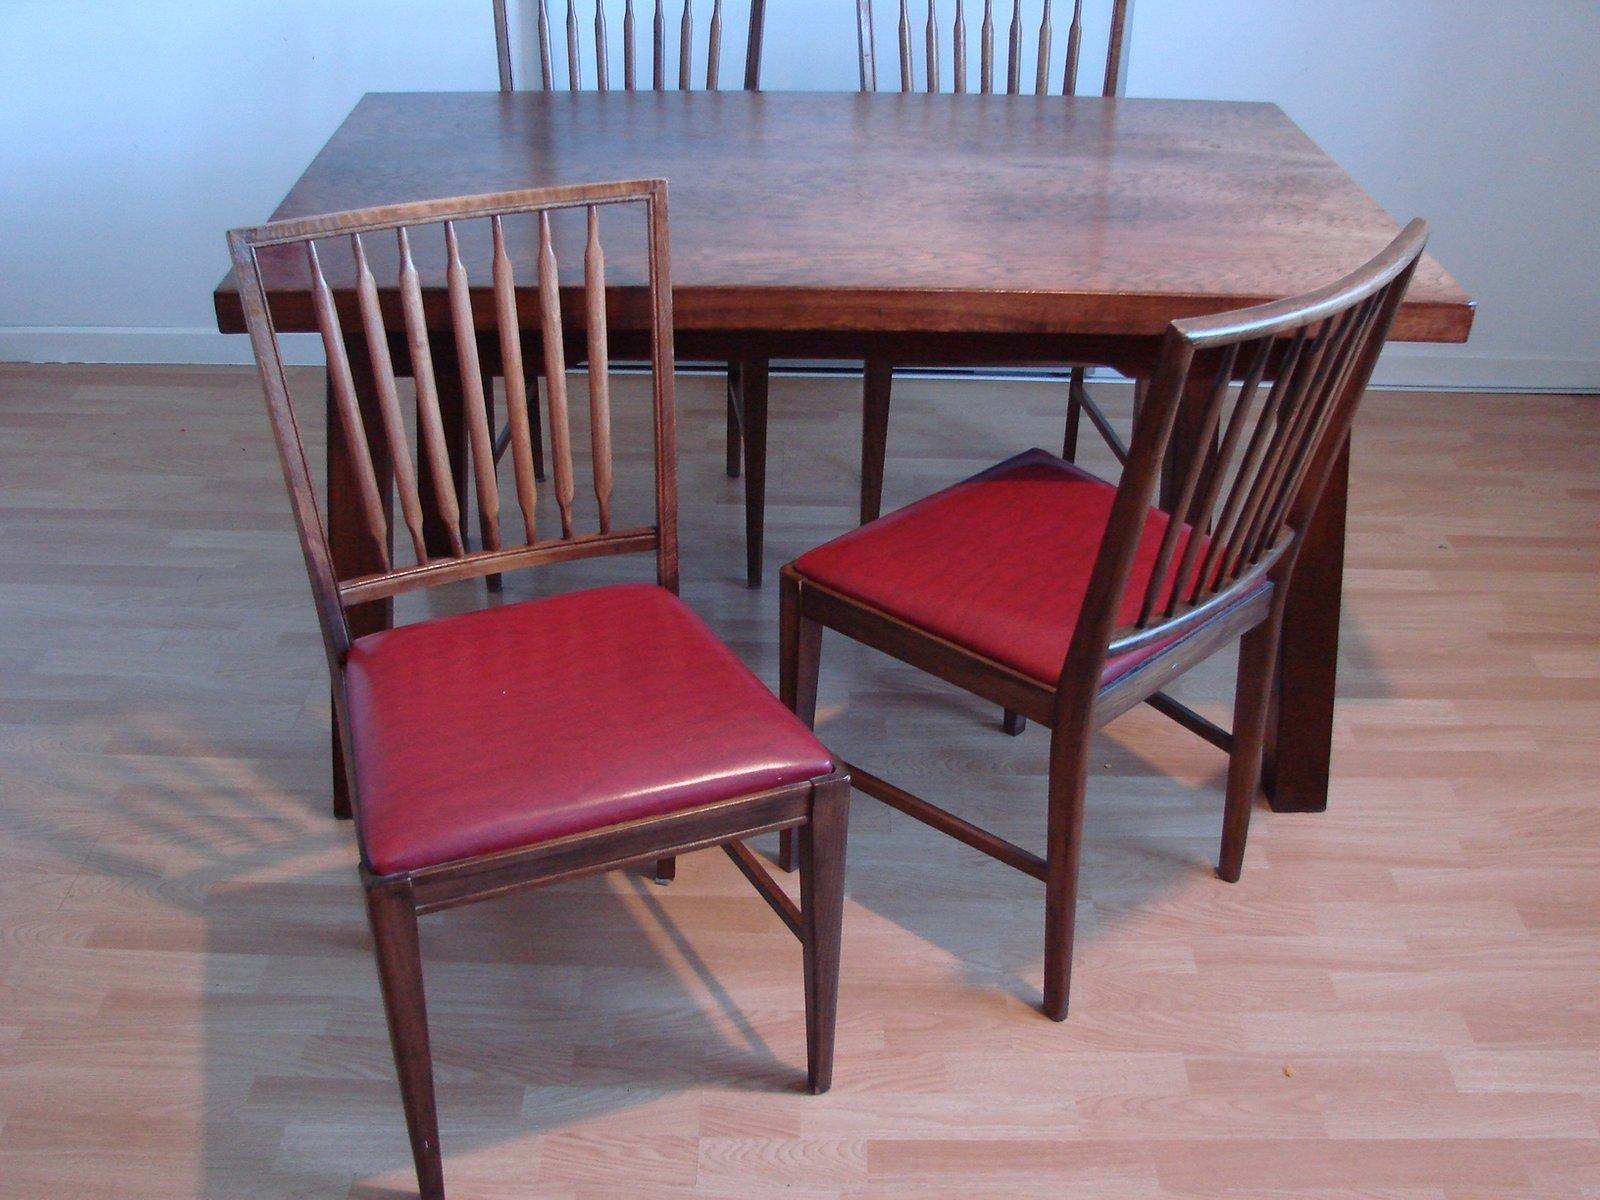 tisch 4 st hle 1960er bei pamono kaufen. Black Bedroom Furniture Sets. Home Design Ideas